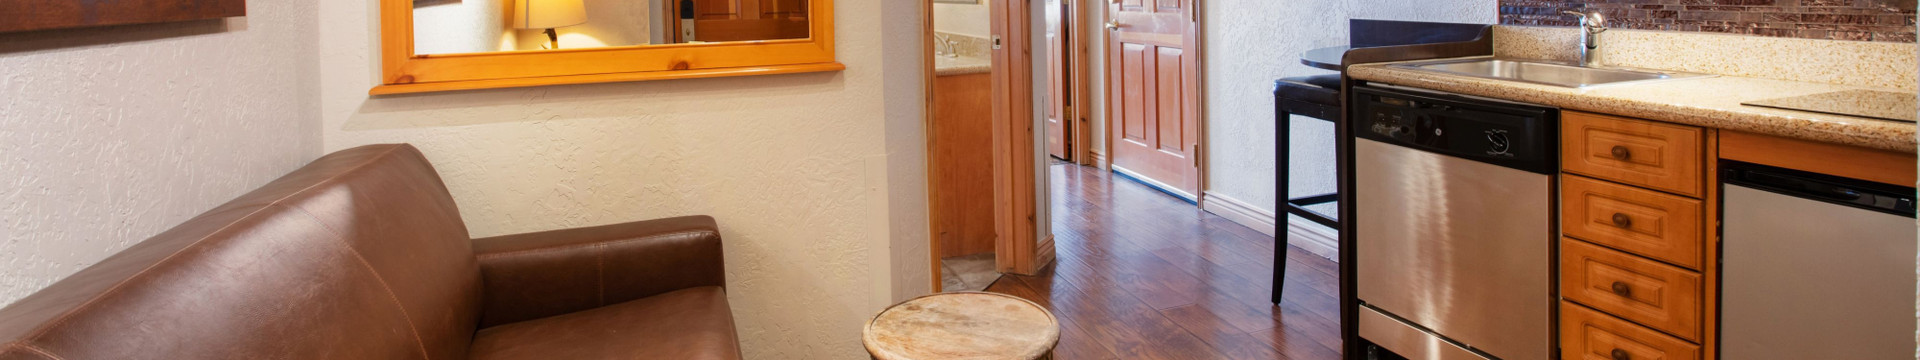 Suites at our Park City, Utah Hotel and Ski Resort | Bedroom in Signature Suite